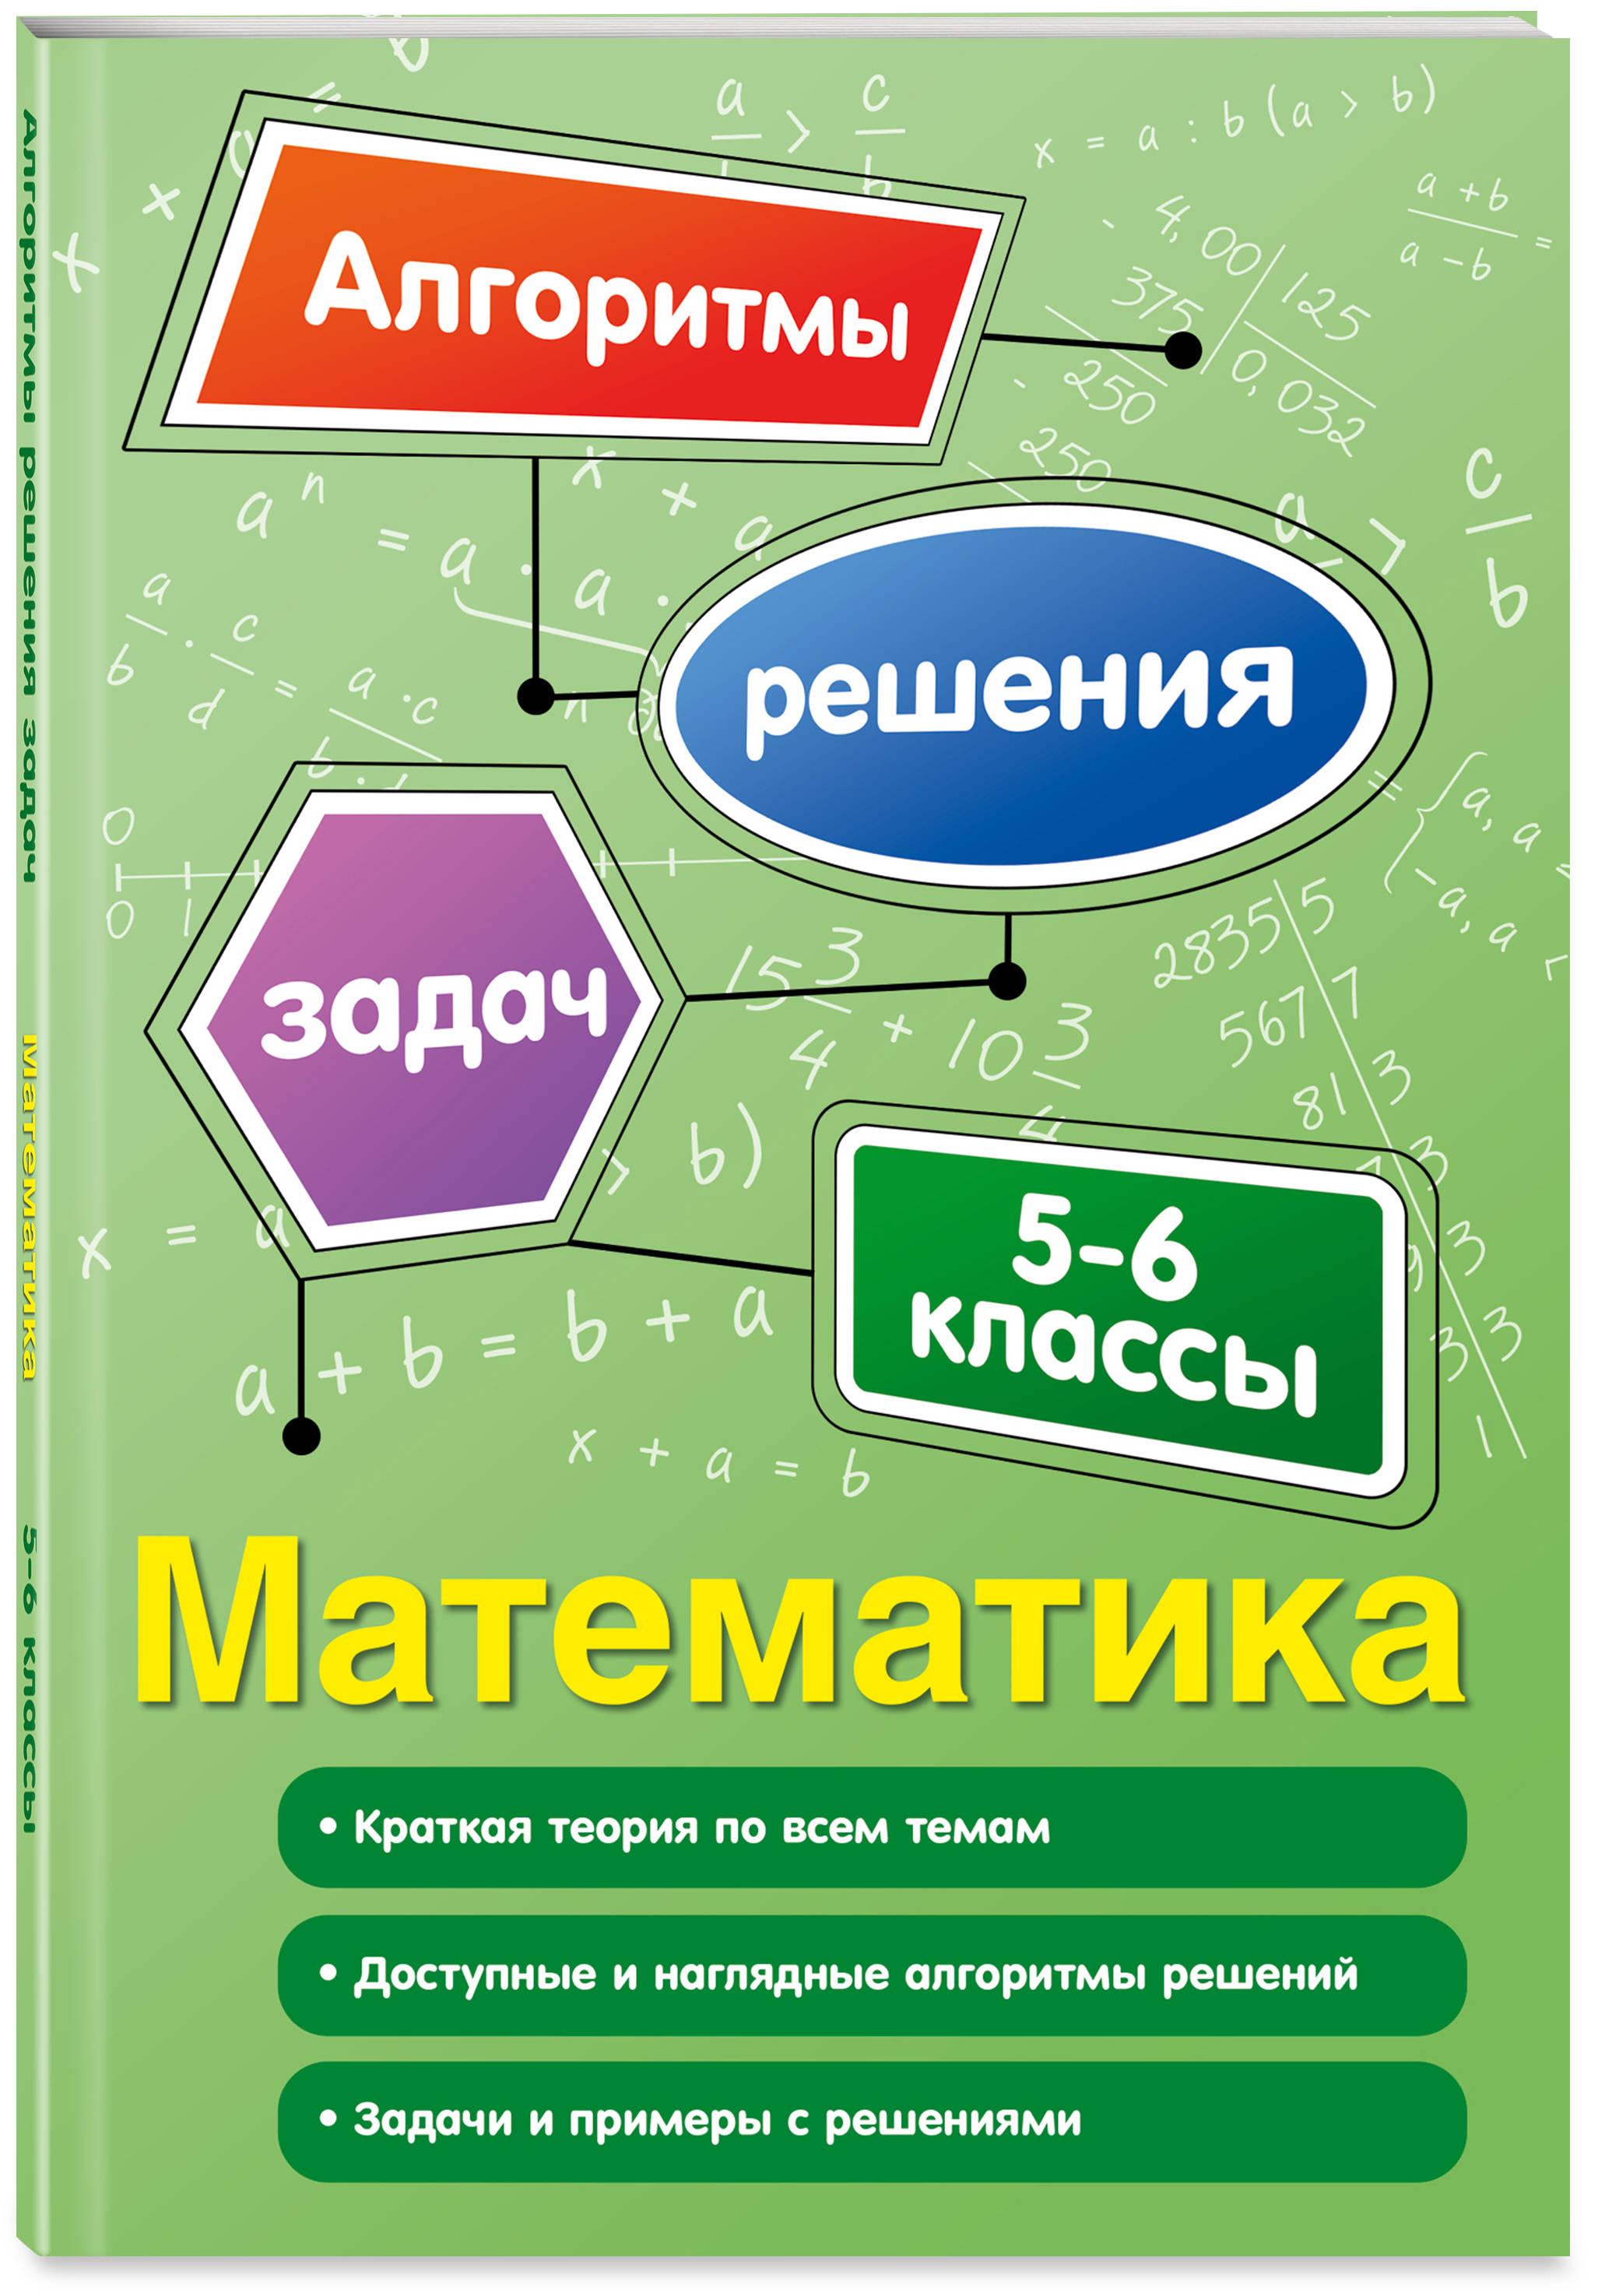 Математика. 5-6 классы ( Виноградова Татьяна Михайловна  )